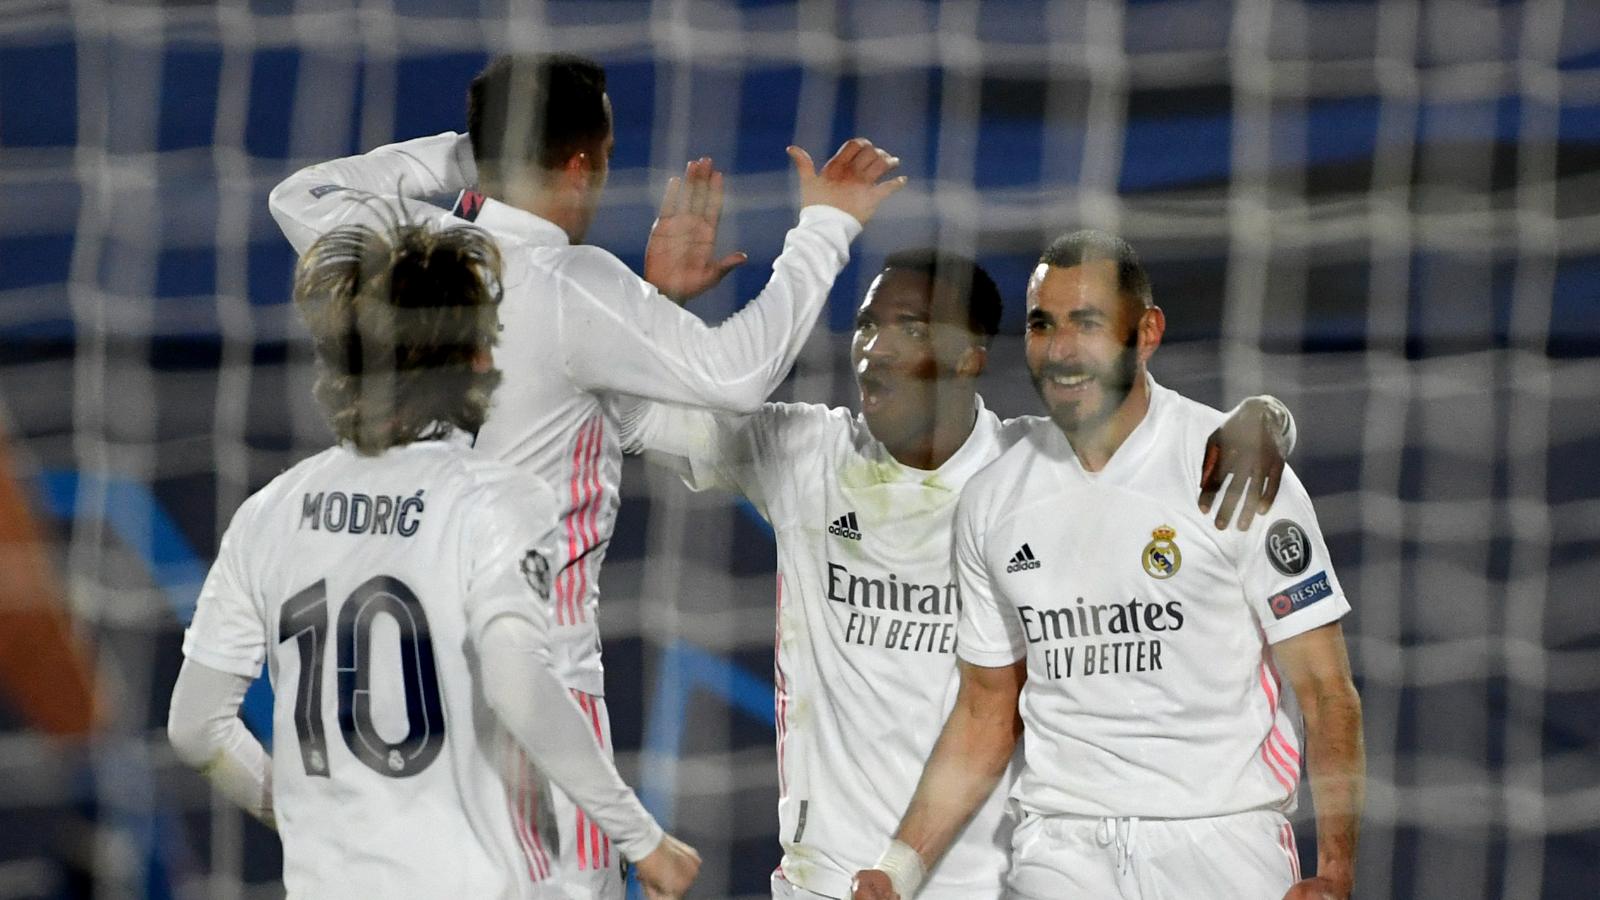 Real Madrid-Atalanta 3-1: la Dea si arrende a Benzema e Ramos, Blancos ai quarti